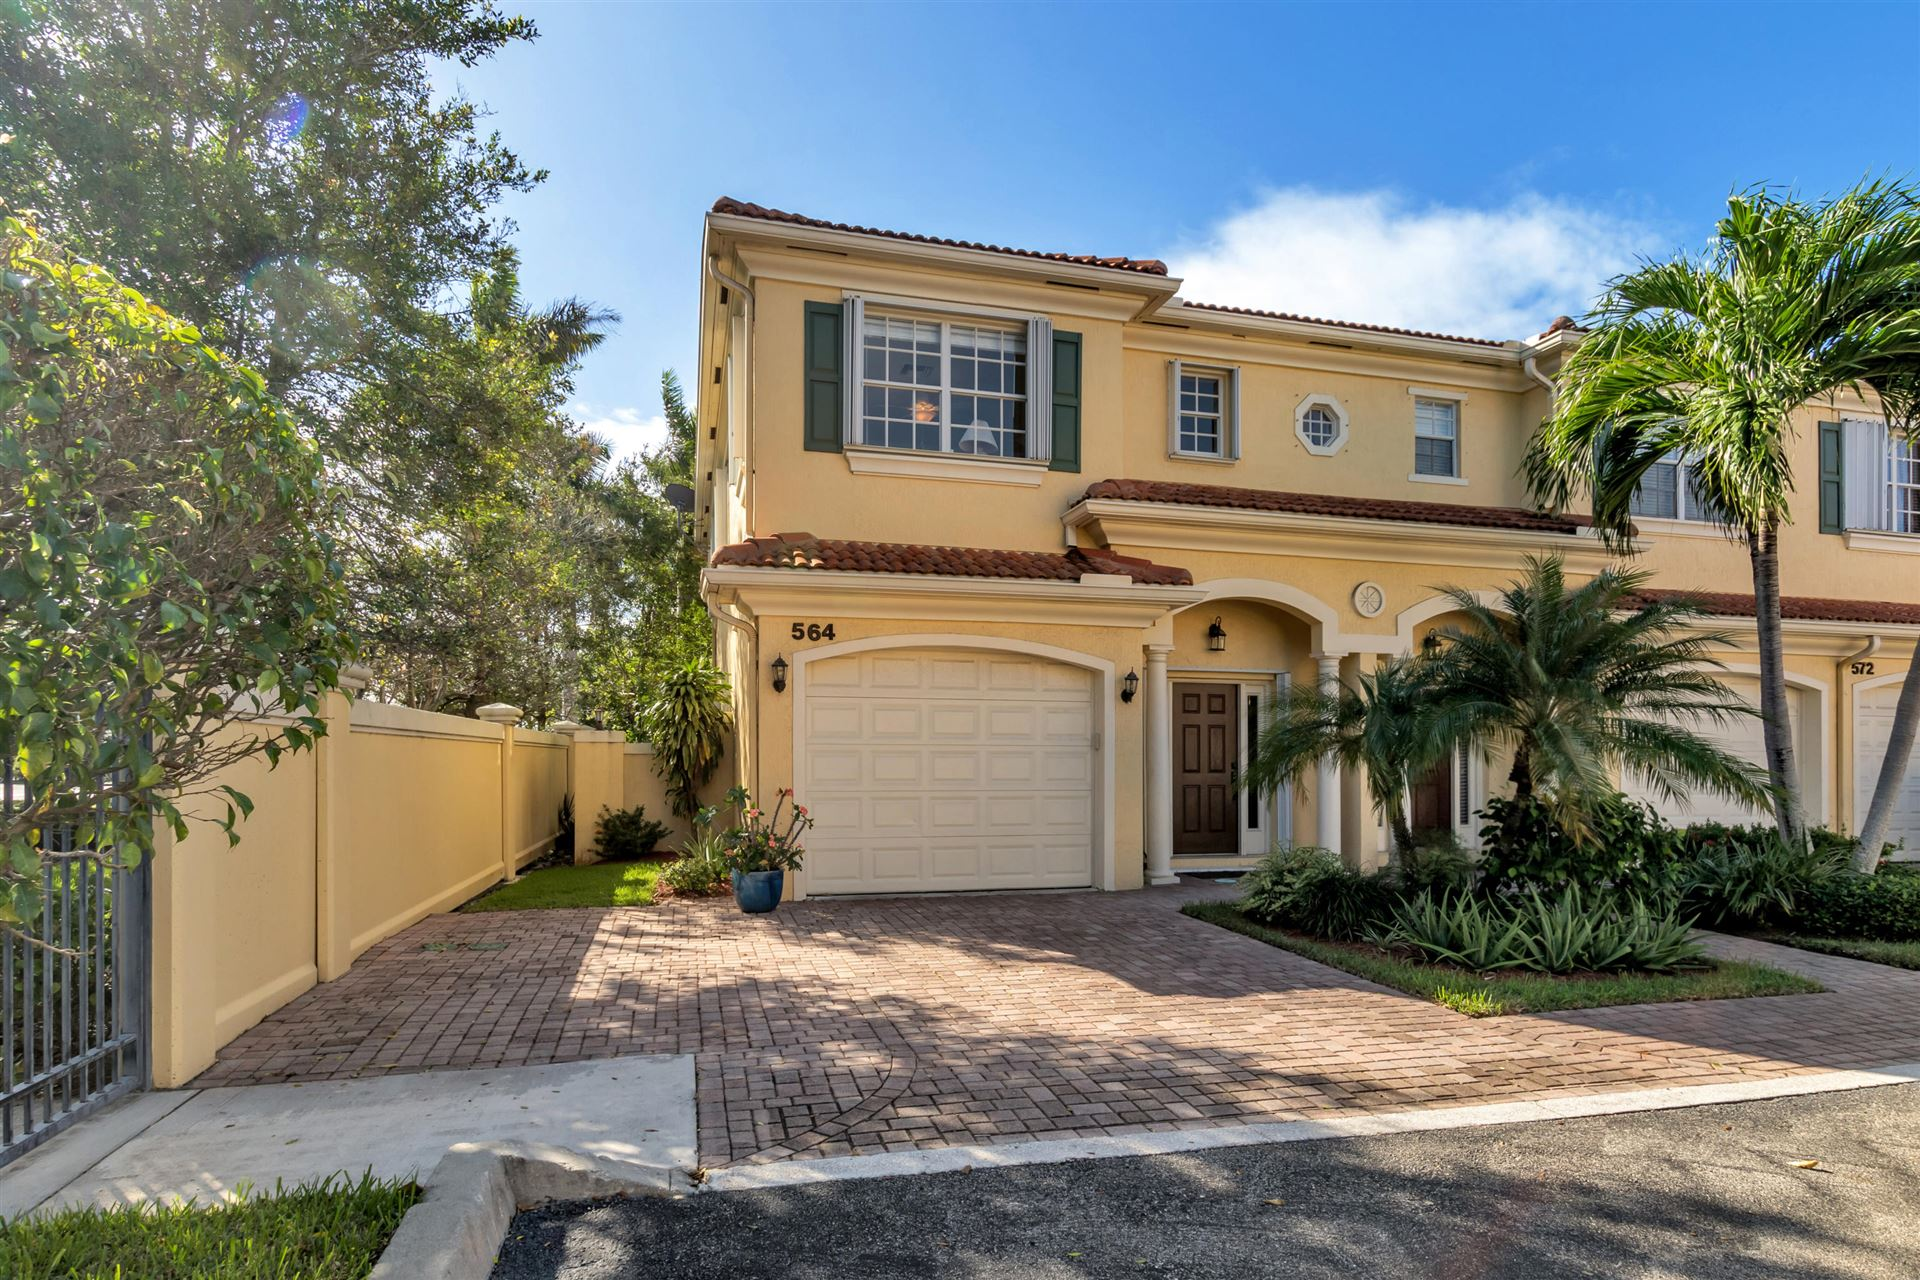 Photo of 564 Marbella Circle, North Palm Beach, FL 33403 (MLS # RX-10674582)